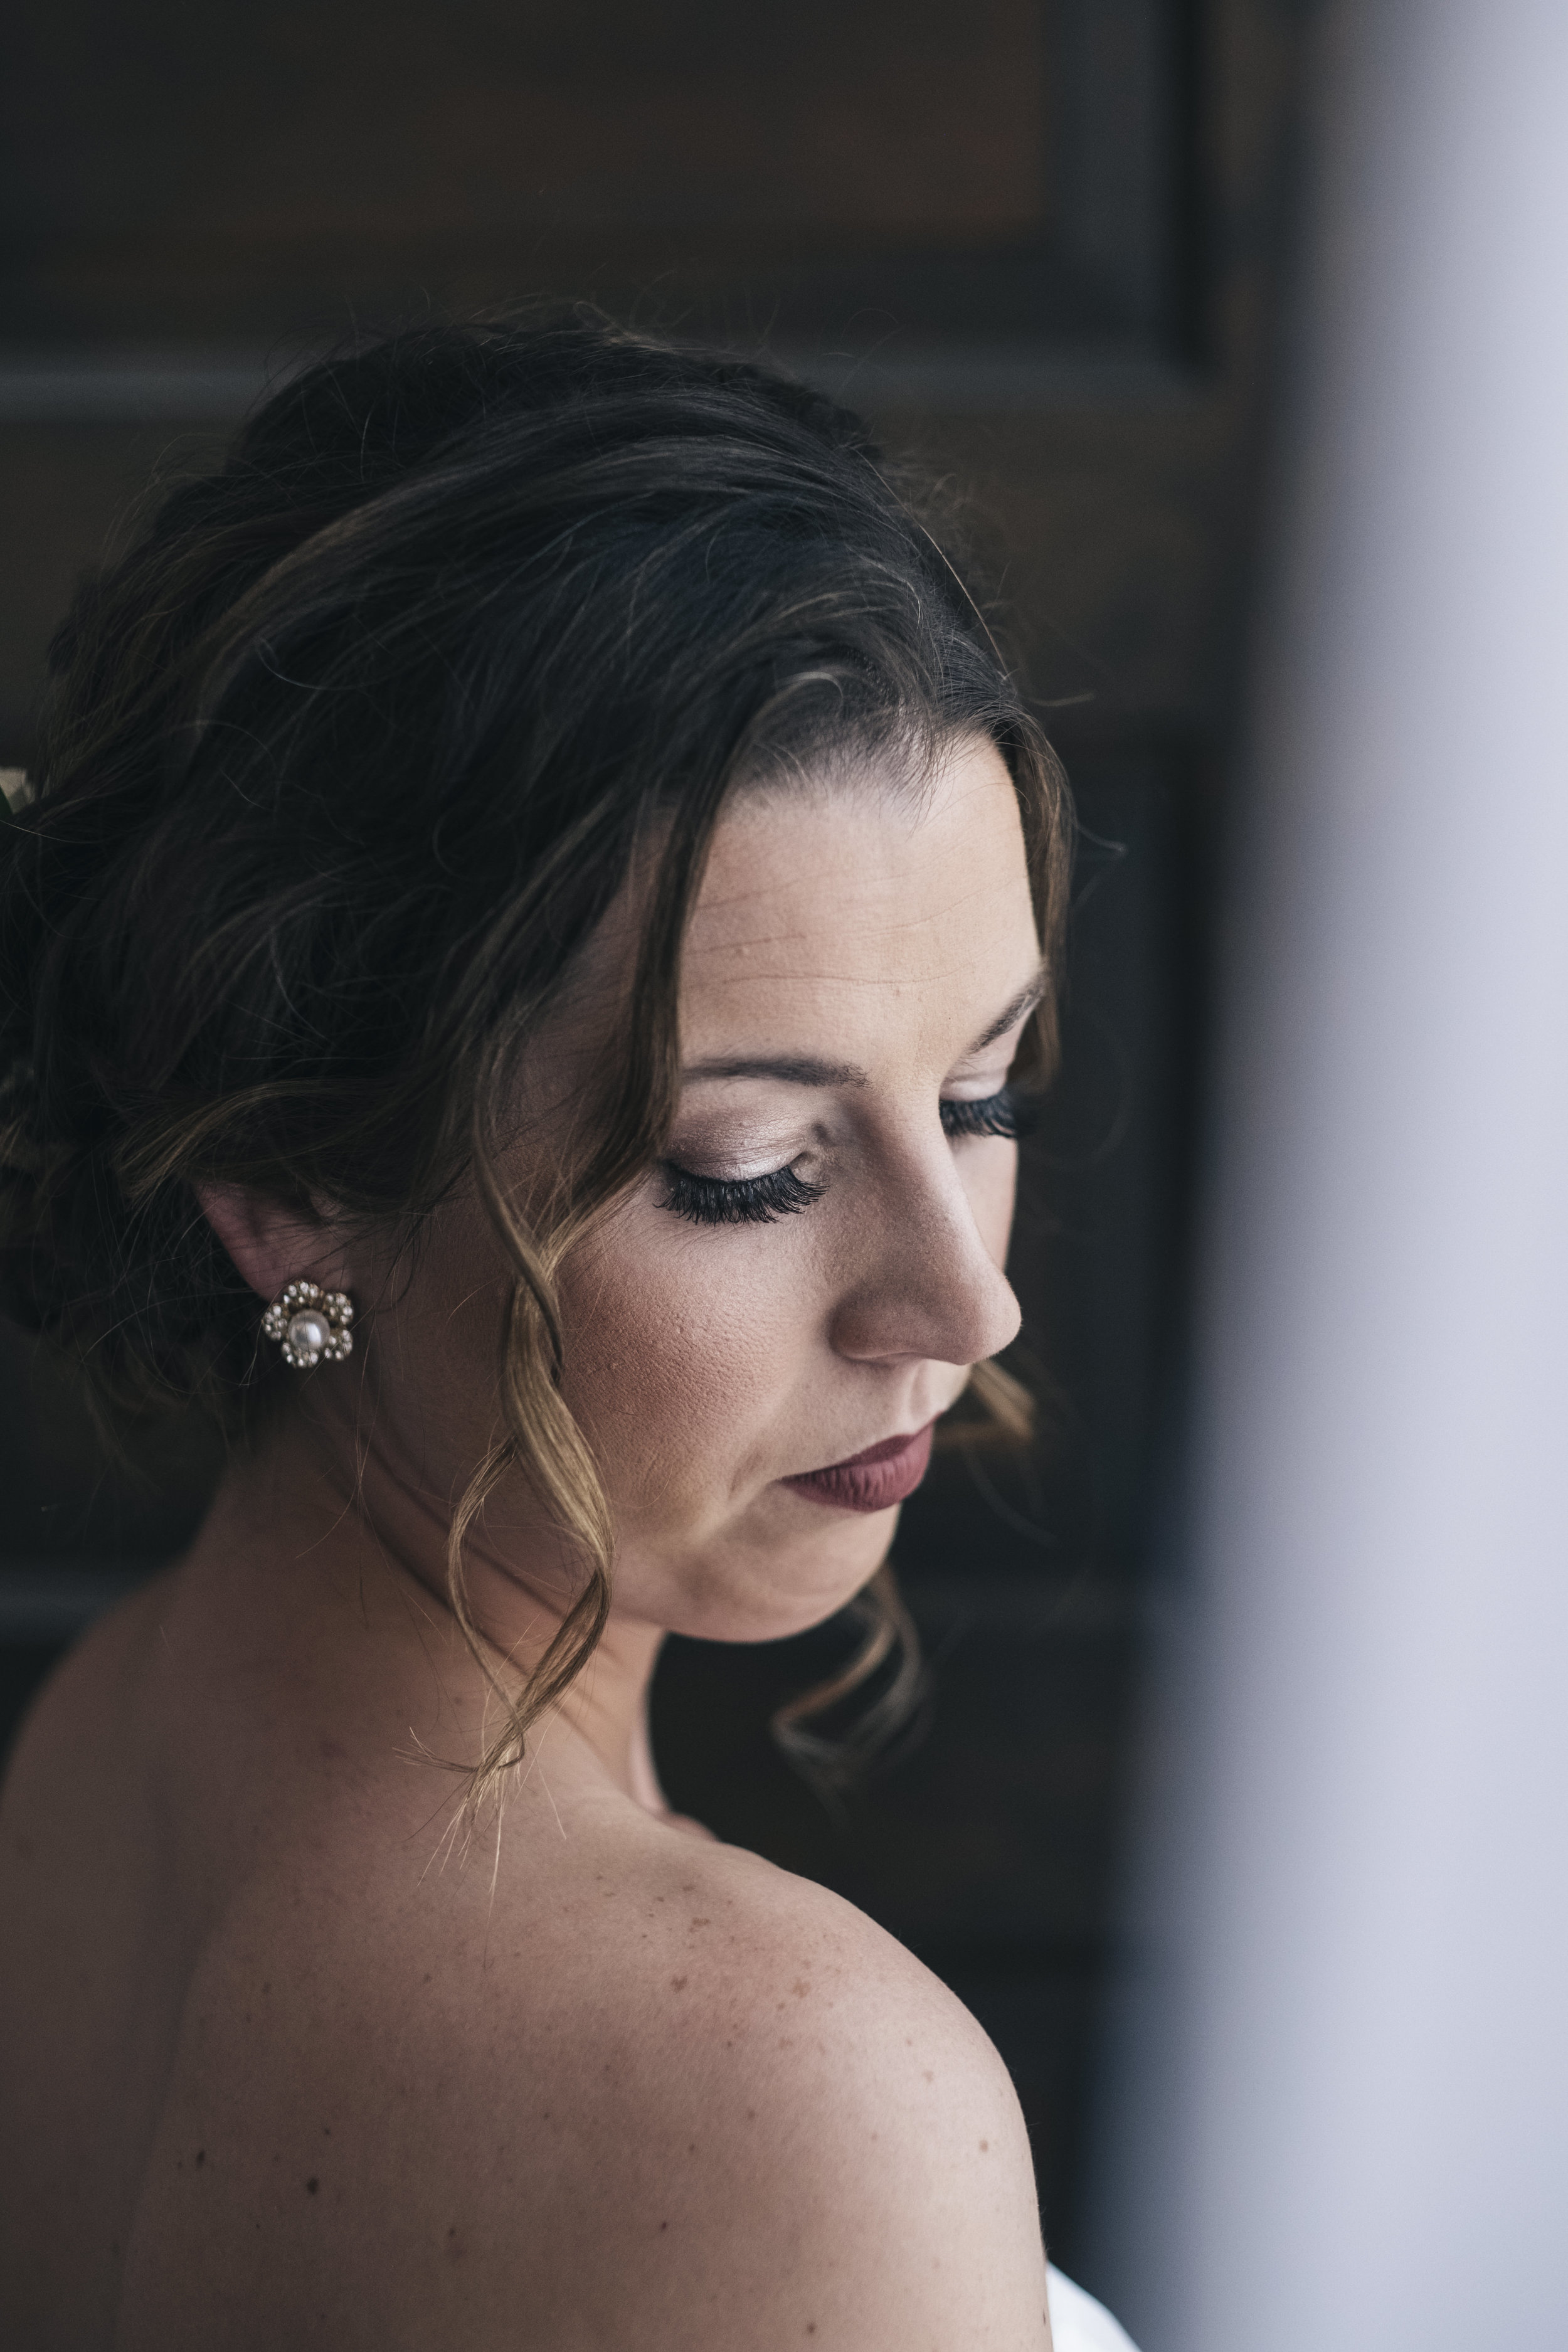 Portrait of the bride before her wedding at Nazareth Hall near Toledo, Ohio.